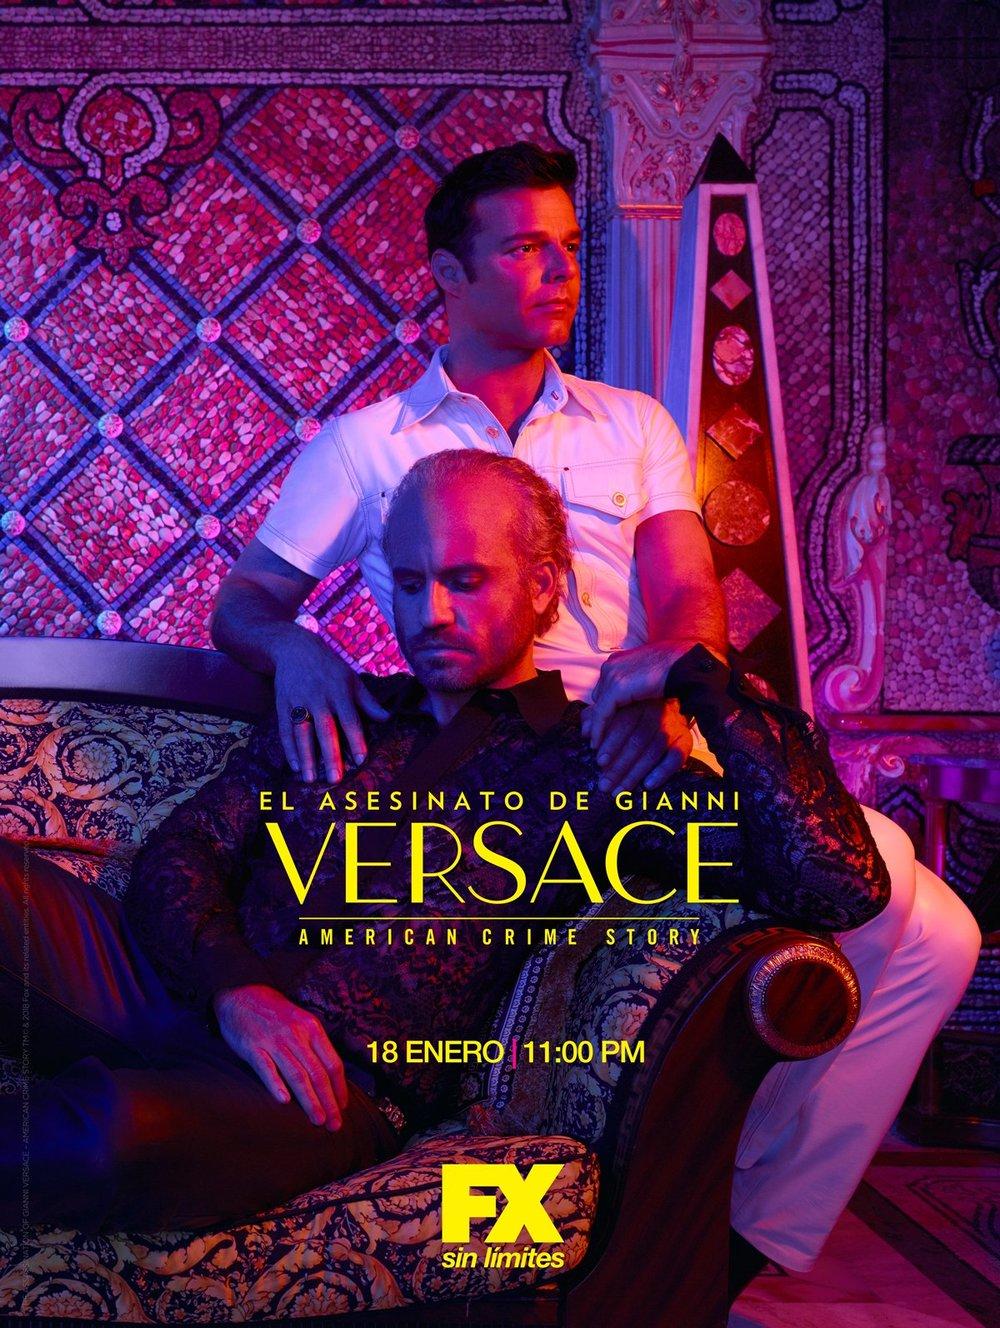 versace poster.jpg